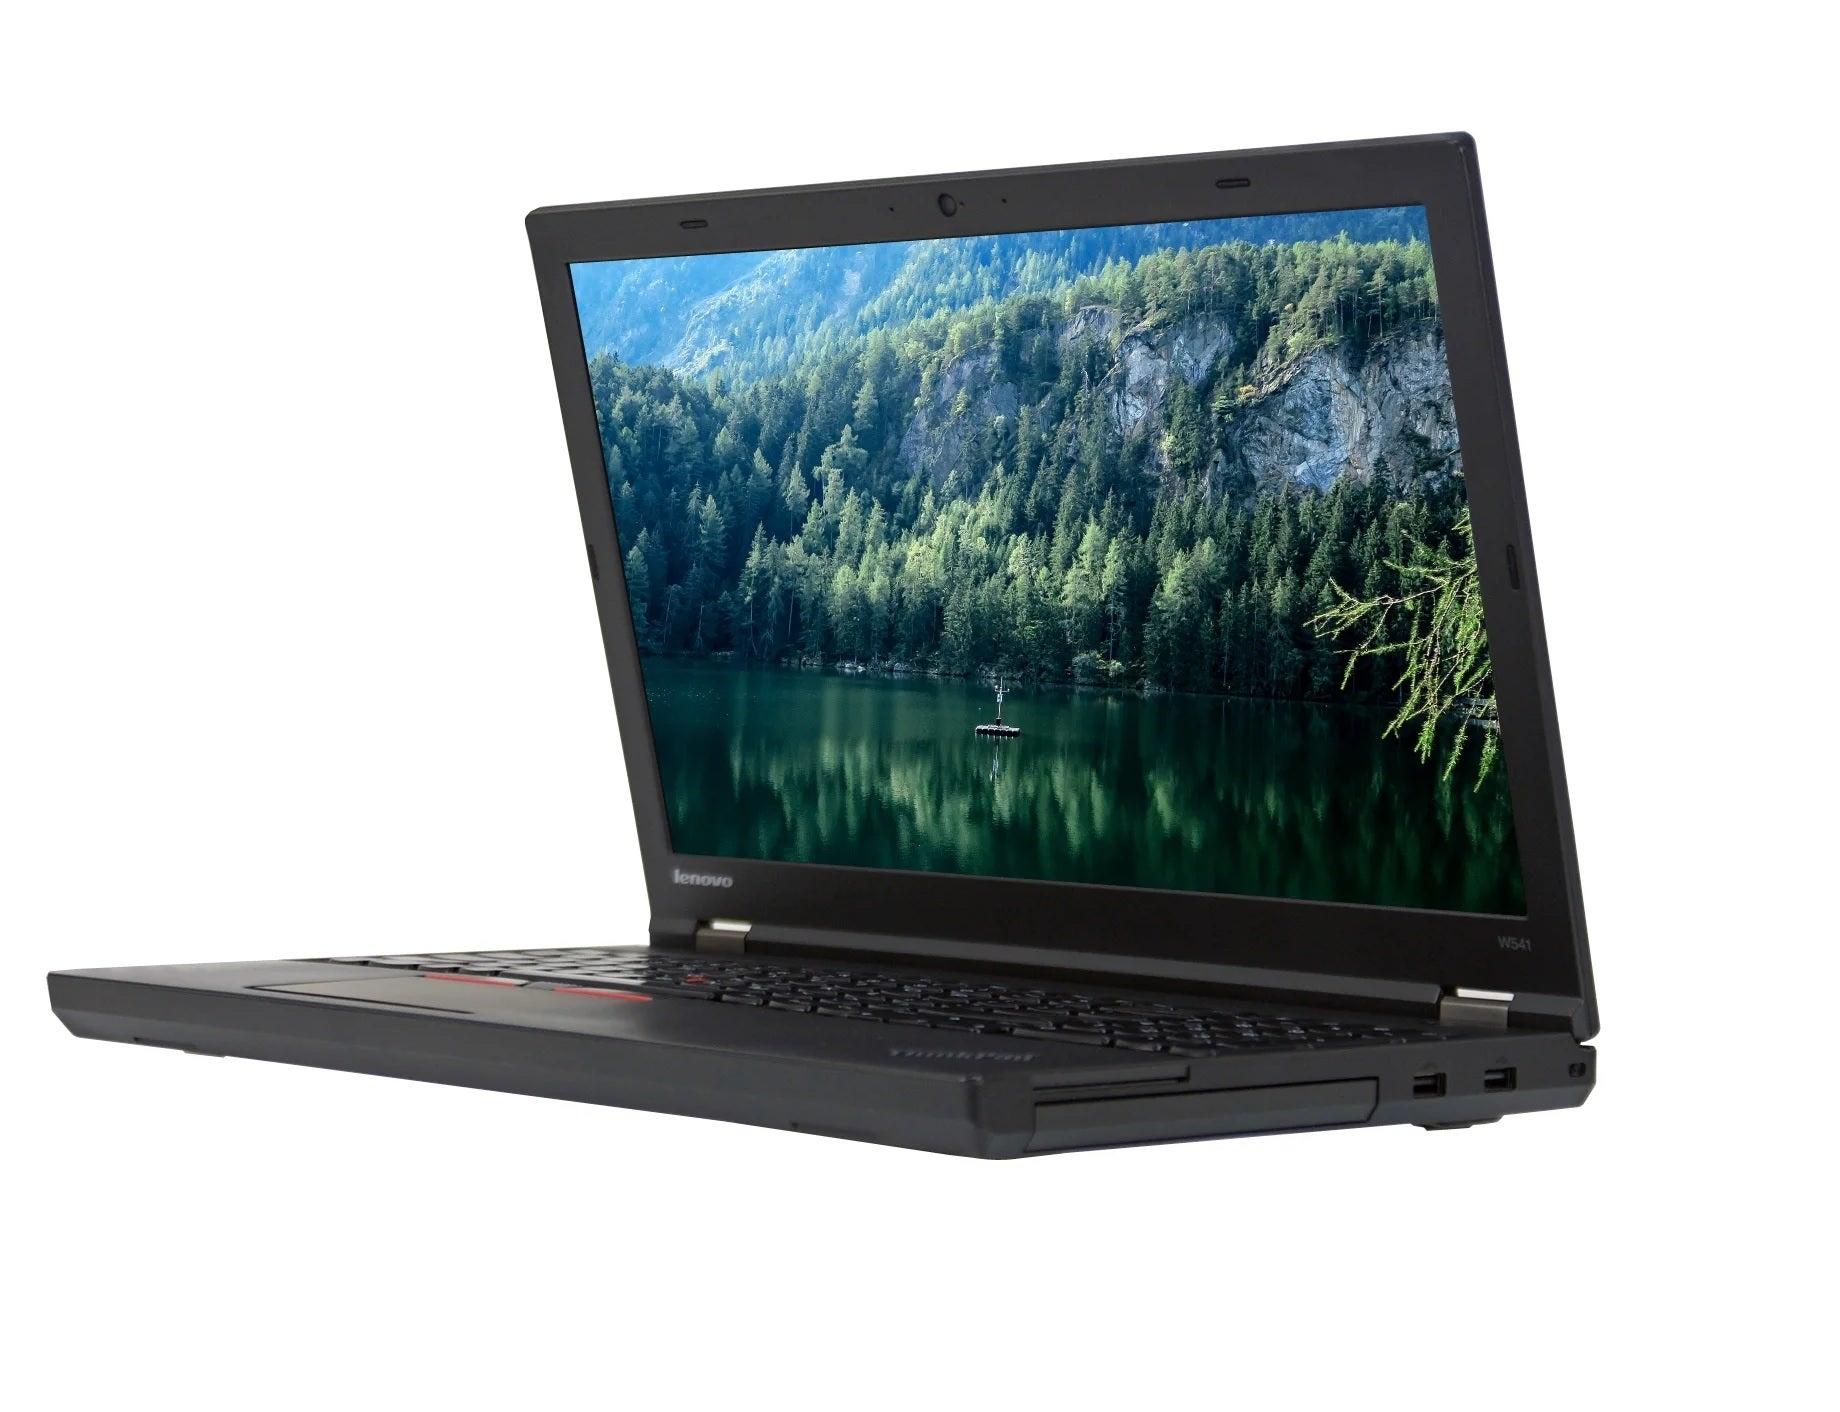 Lenovo ThinkPad W541 15 inch Laptop